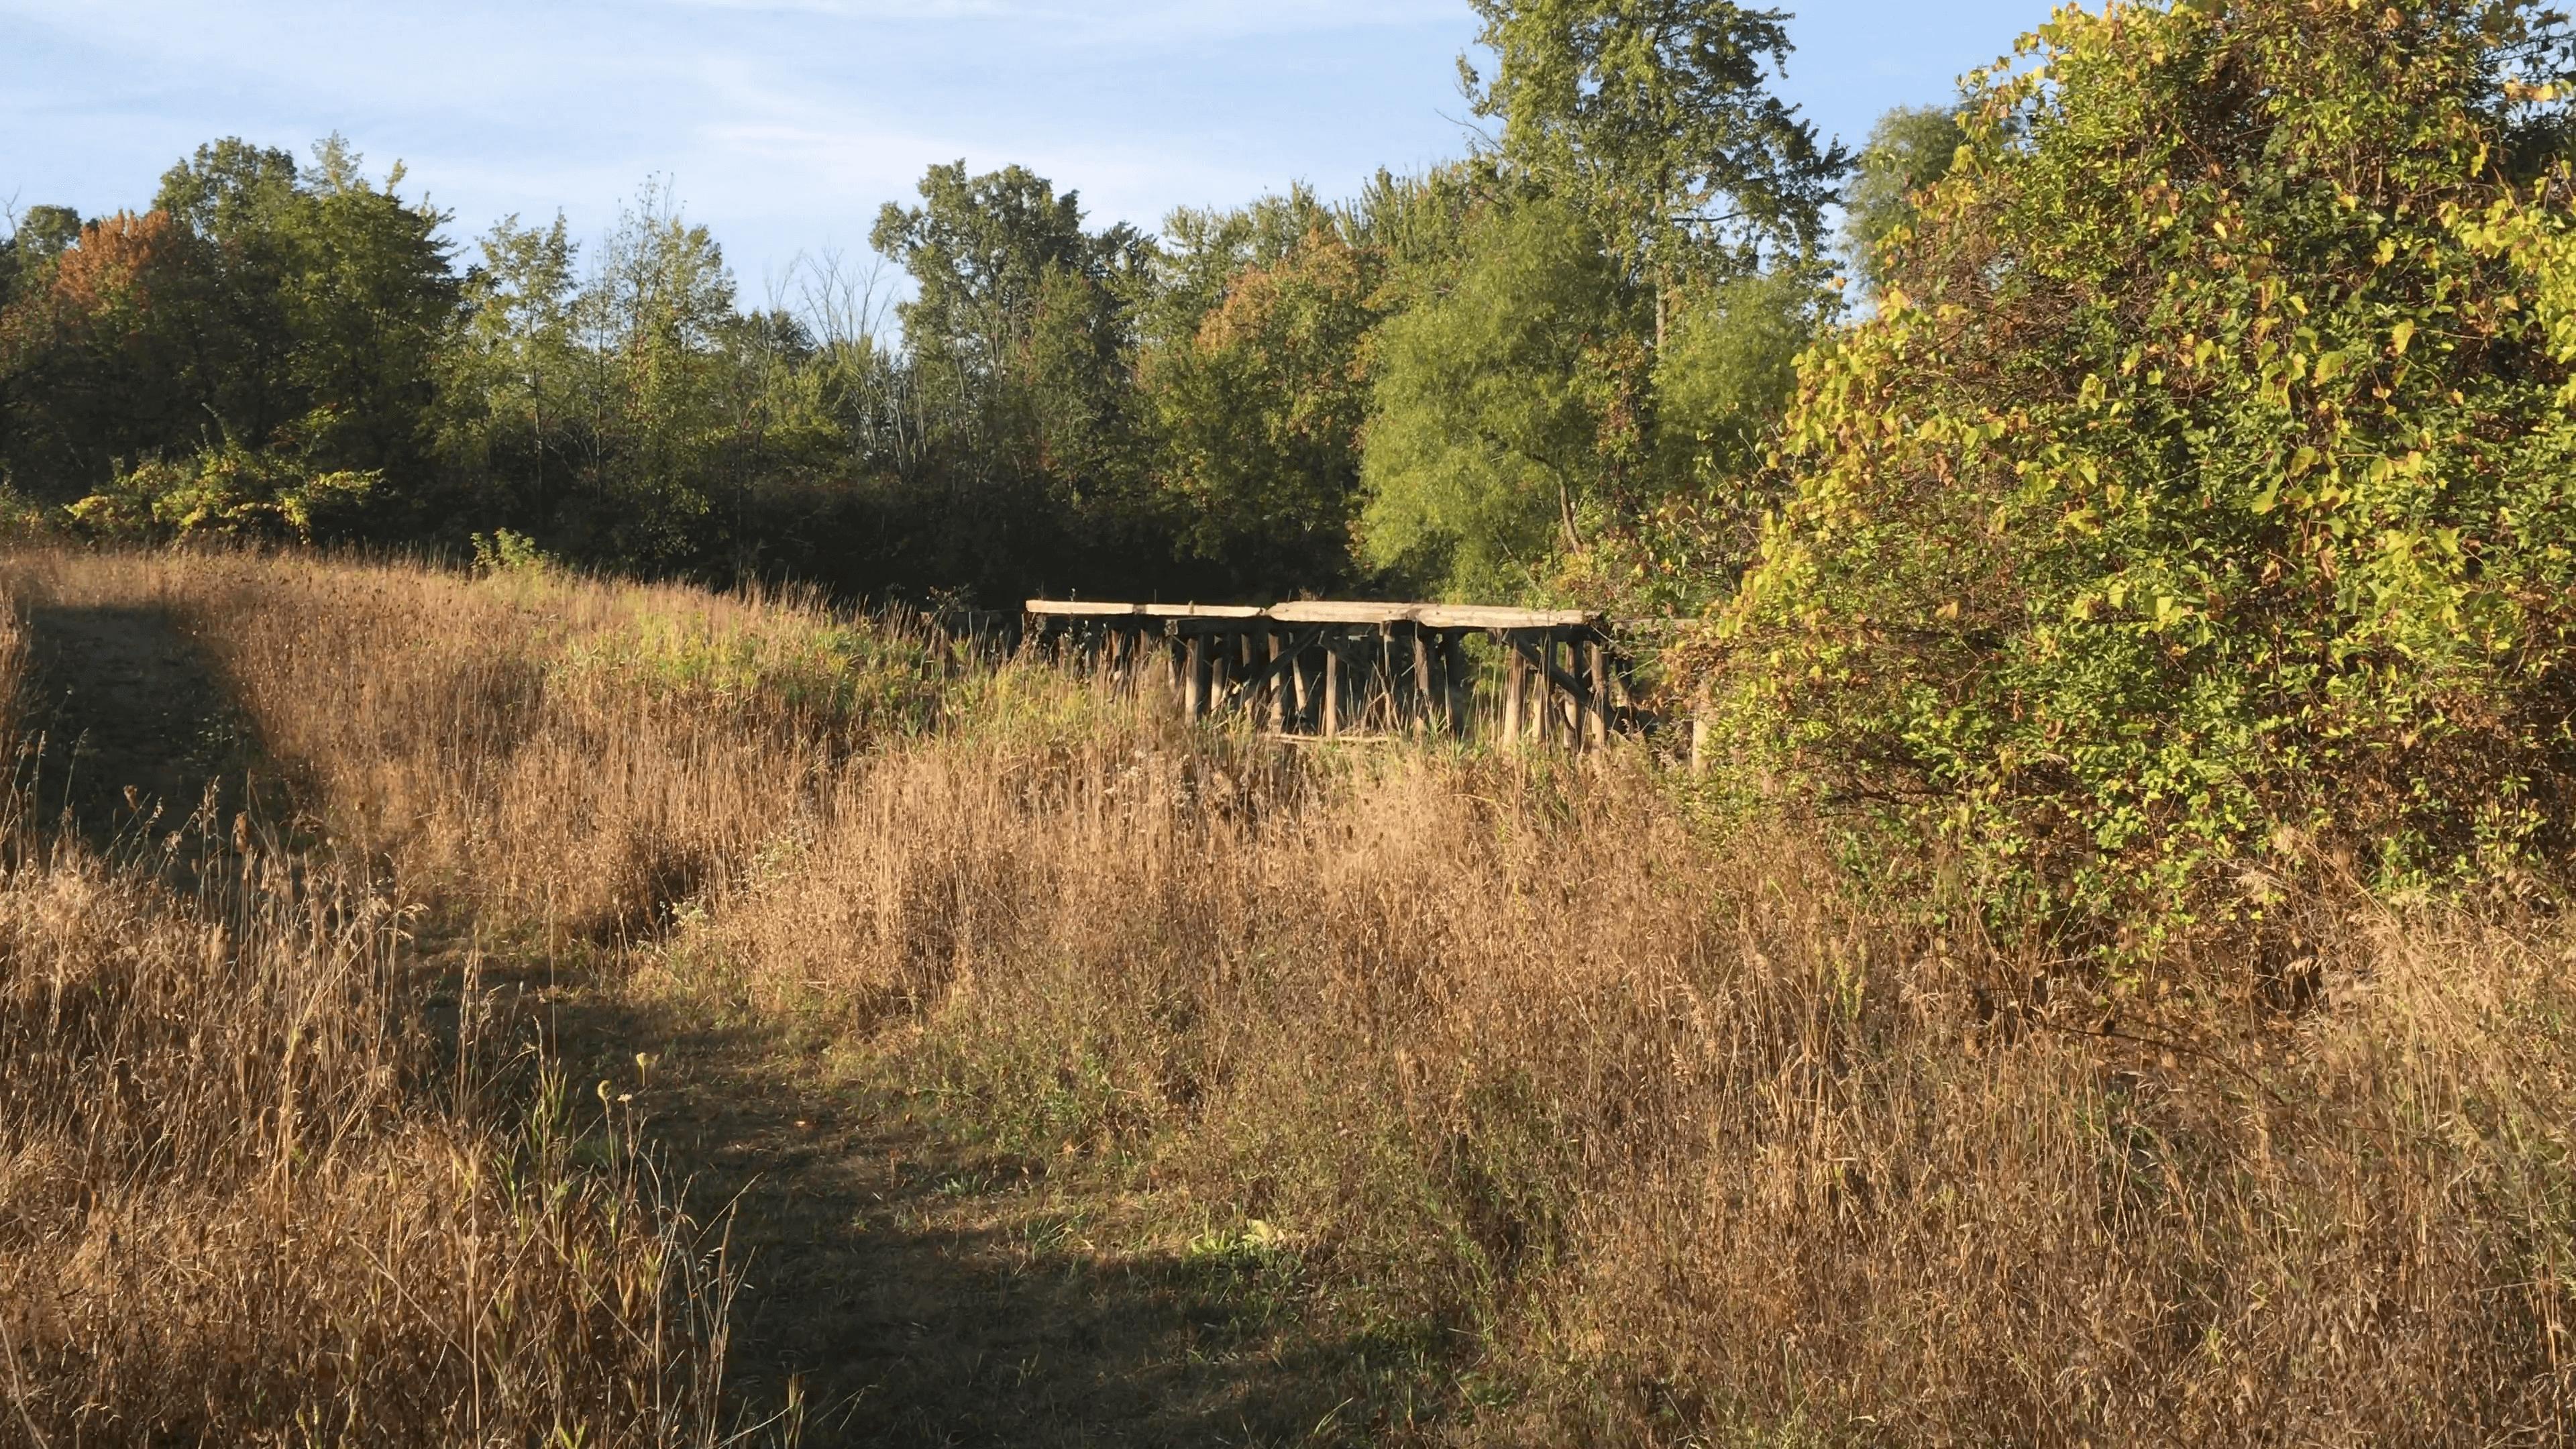 Riverbend Preserve